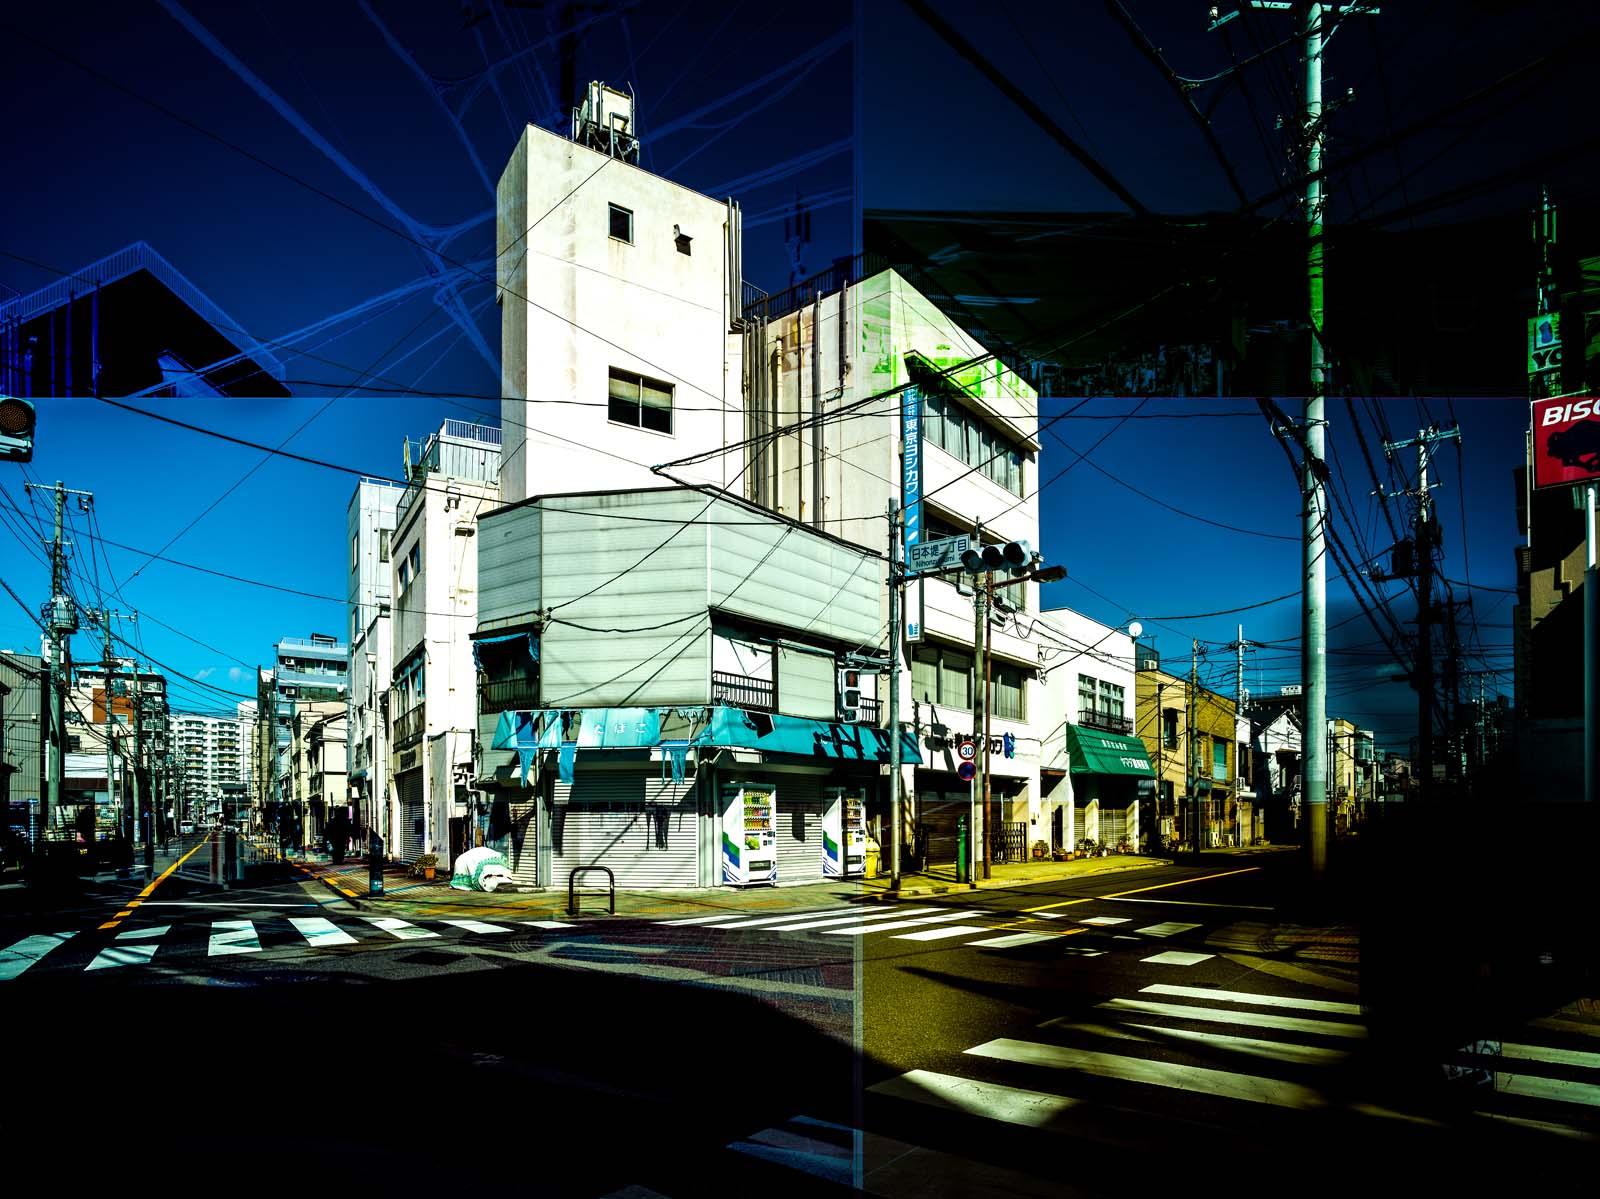 Nihonzutsumi